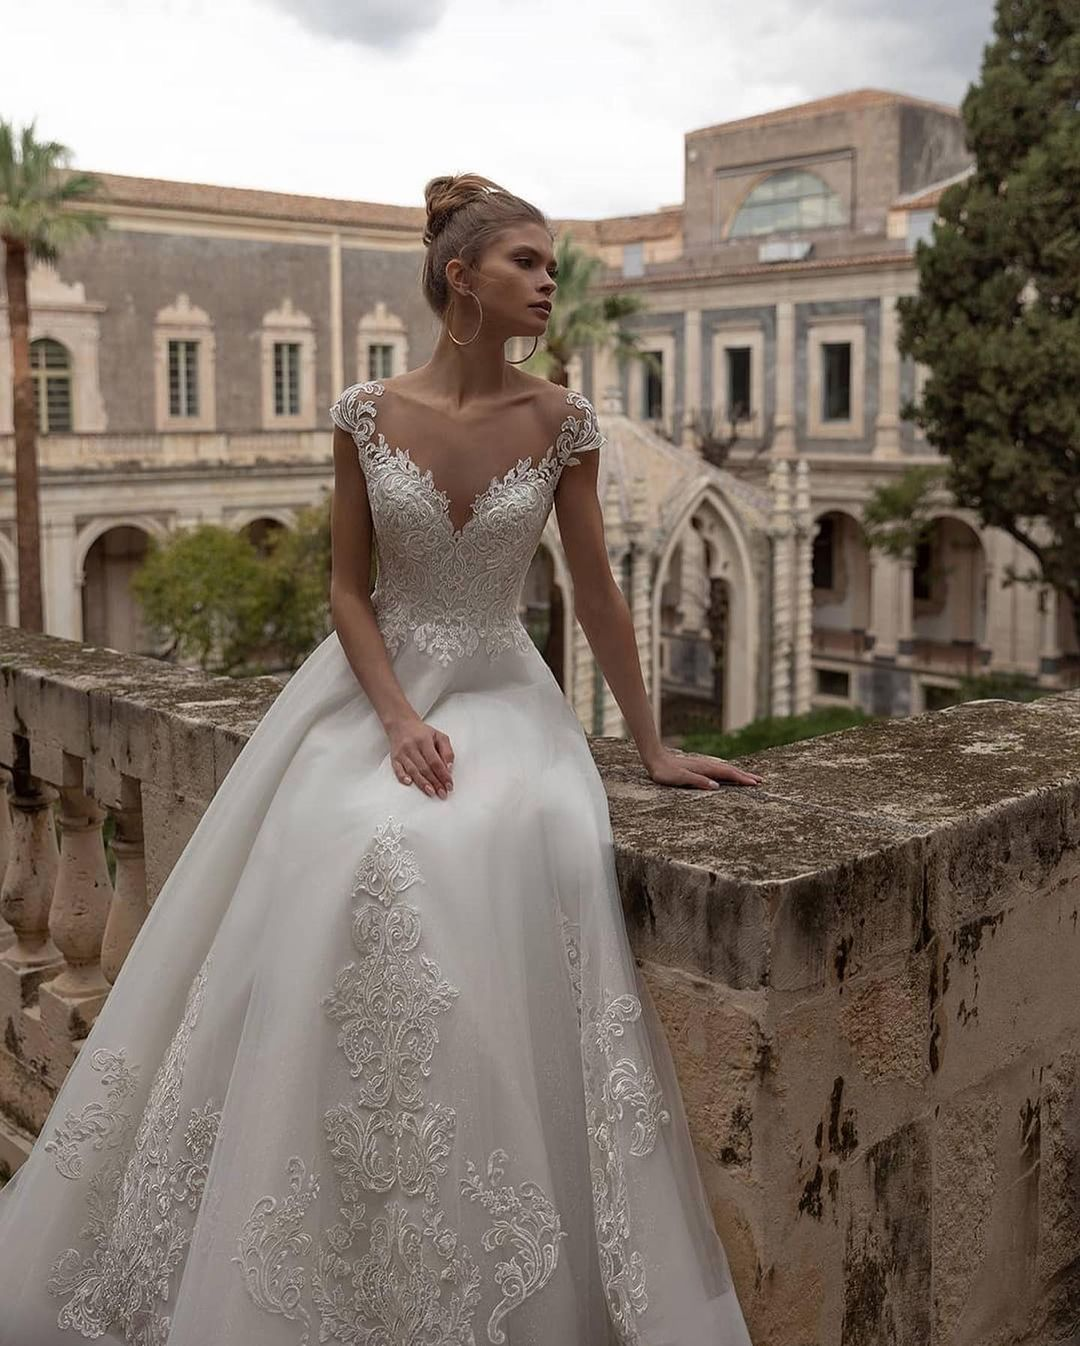 Voluminous lace wedding dress 2021